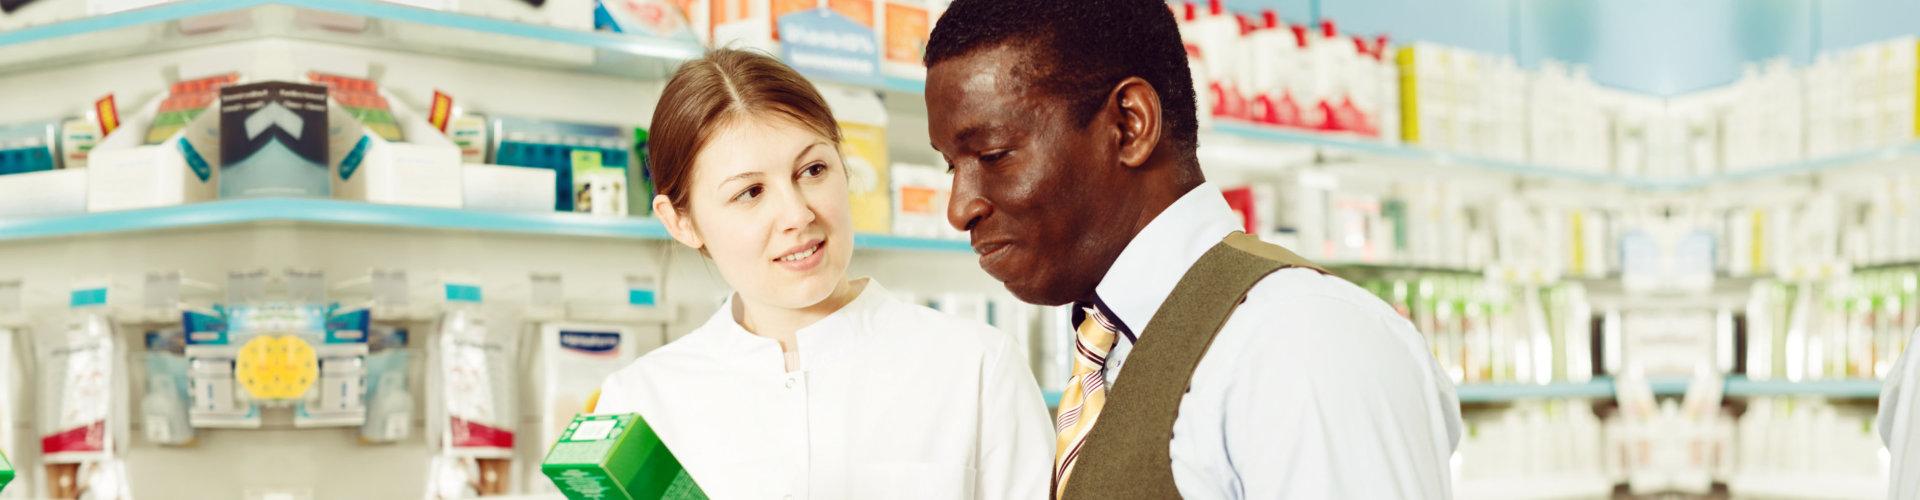 pharmacist helping a customer